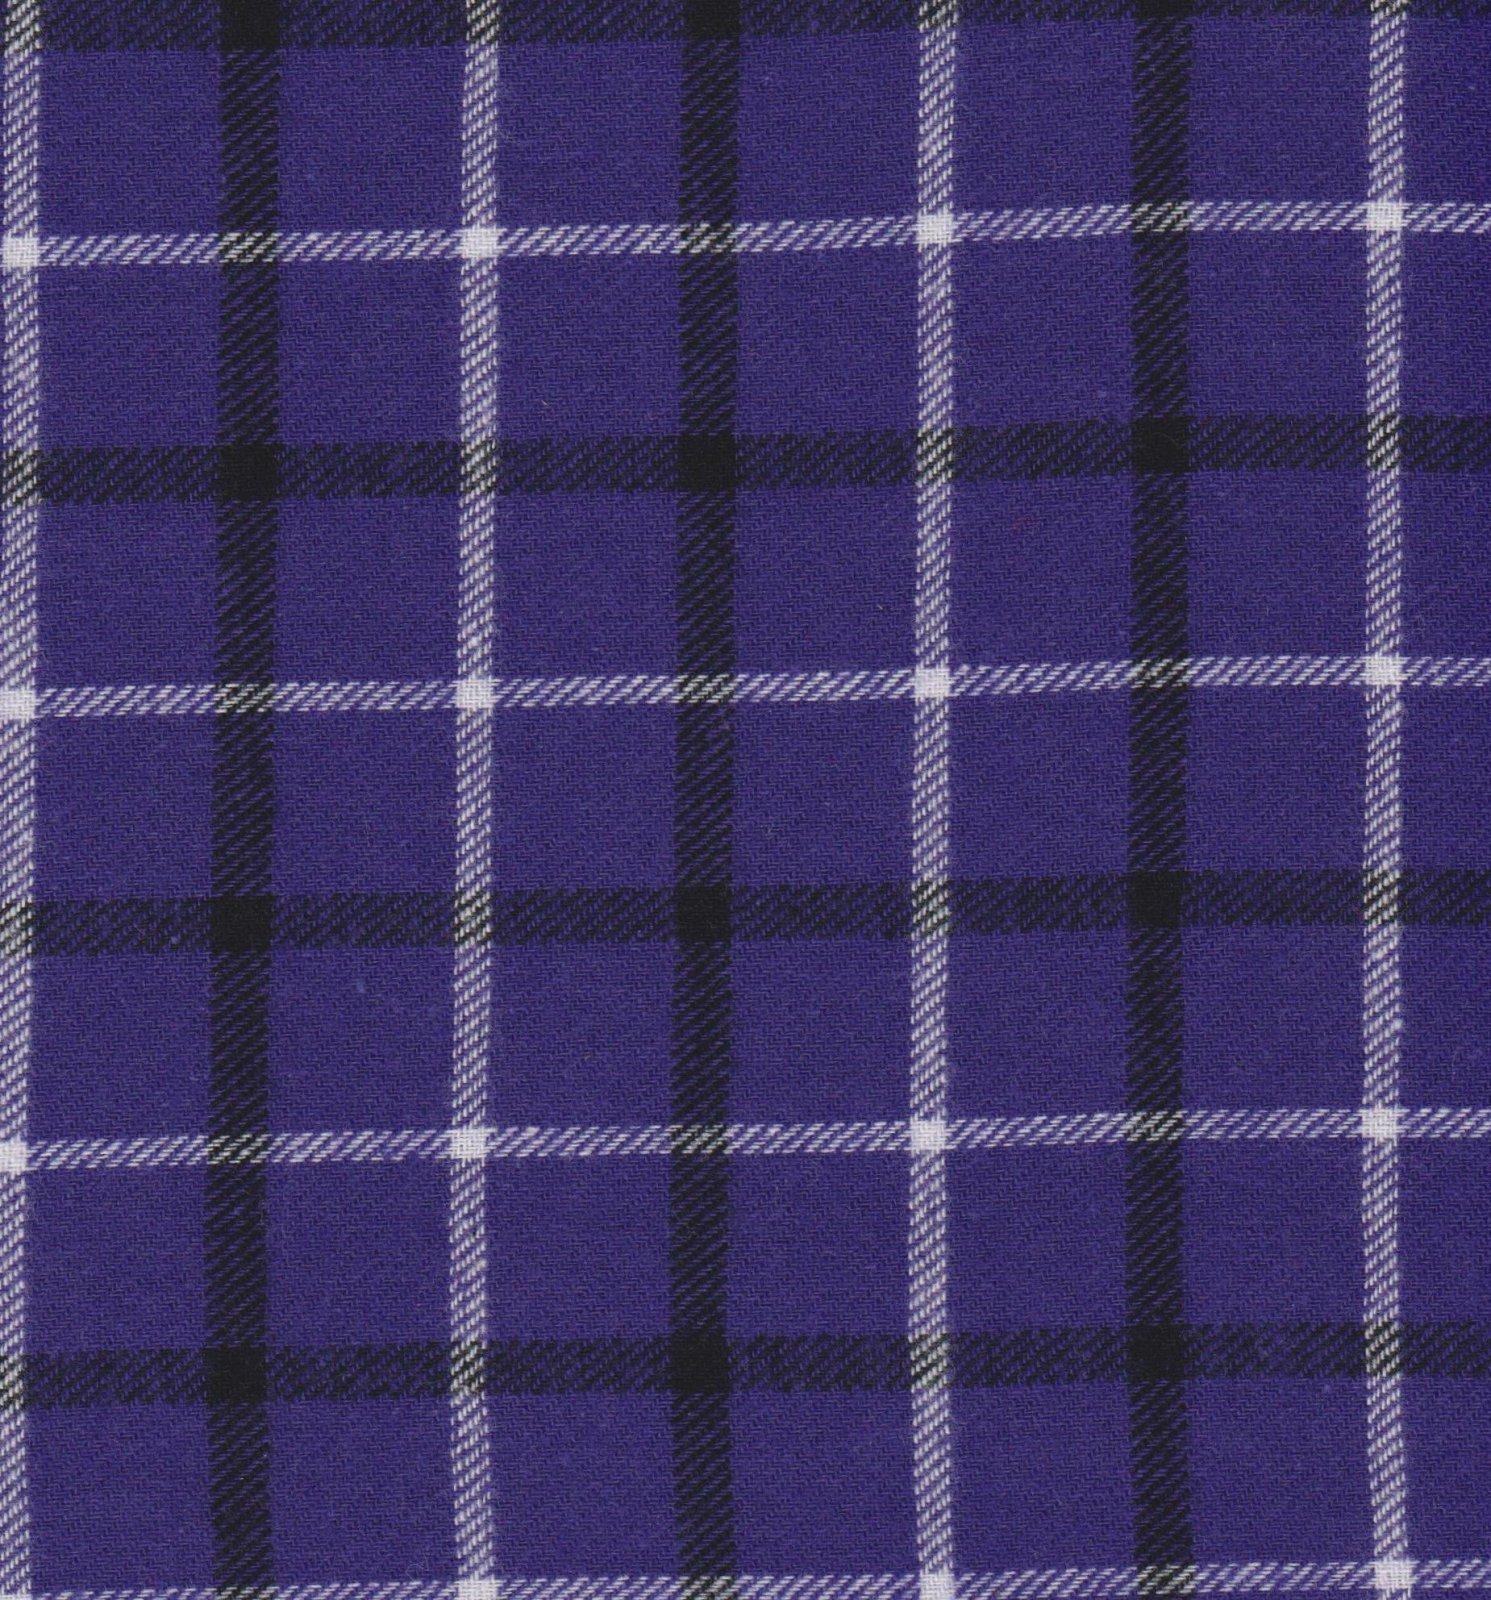 PROMO* Yarn Dyed Flannel Plaid - 2871 Nordic Purple